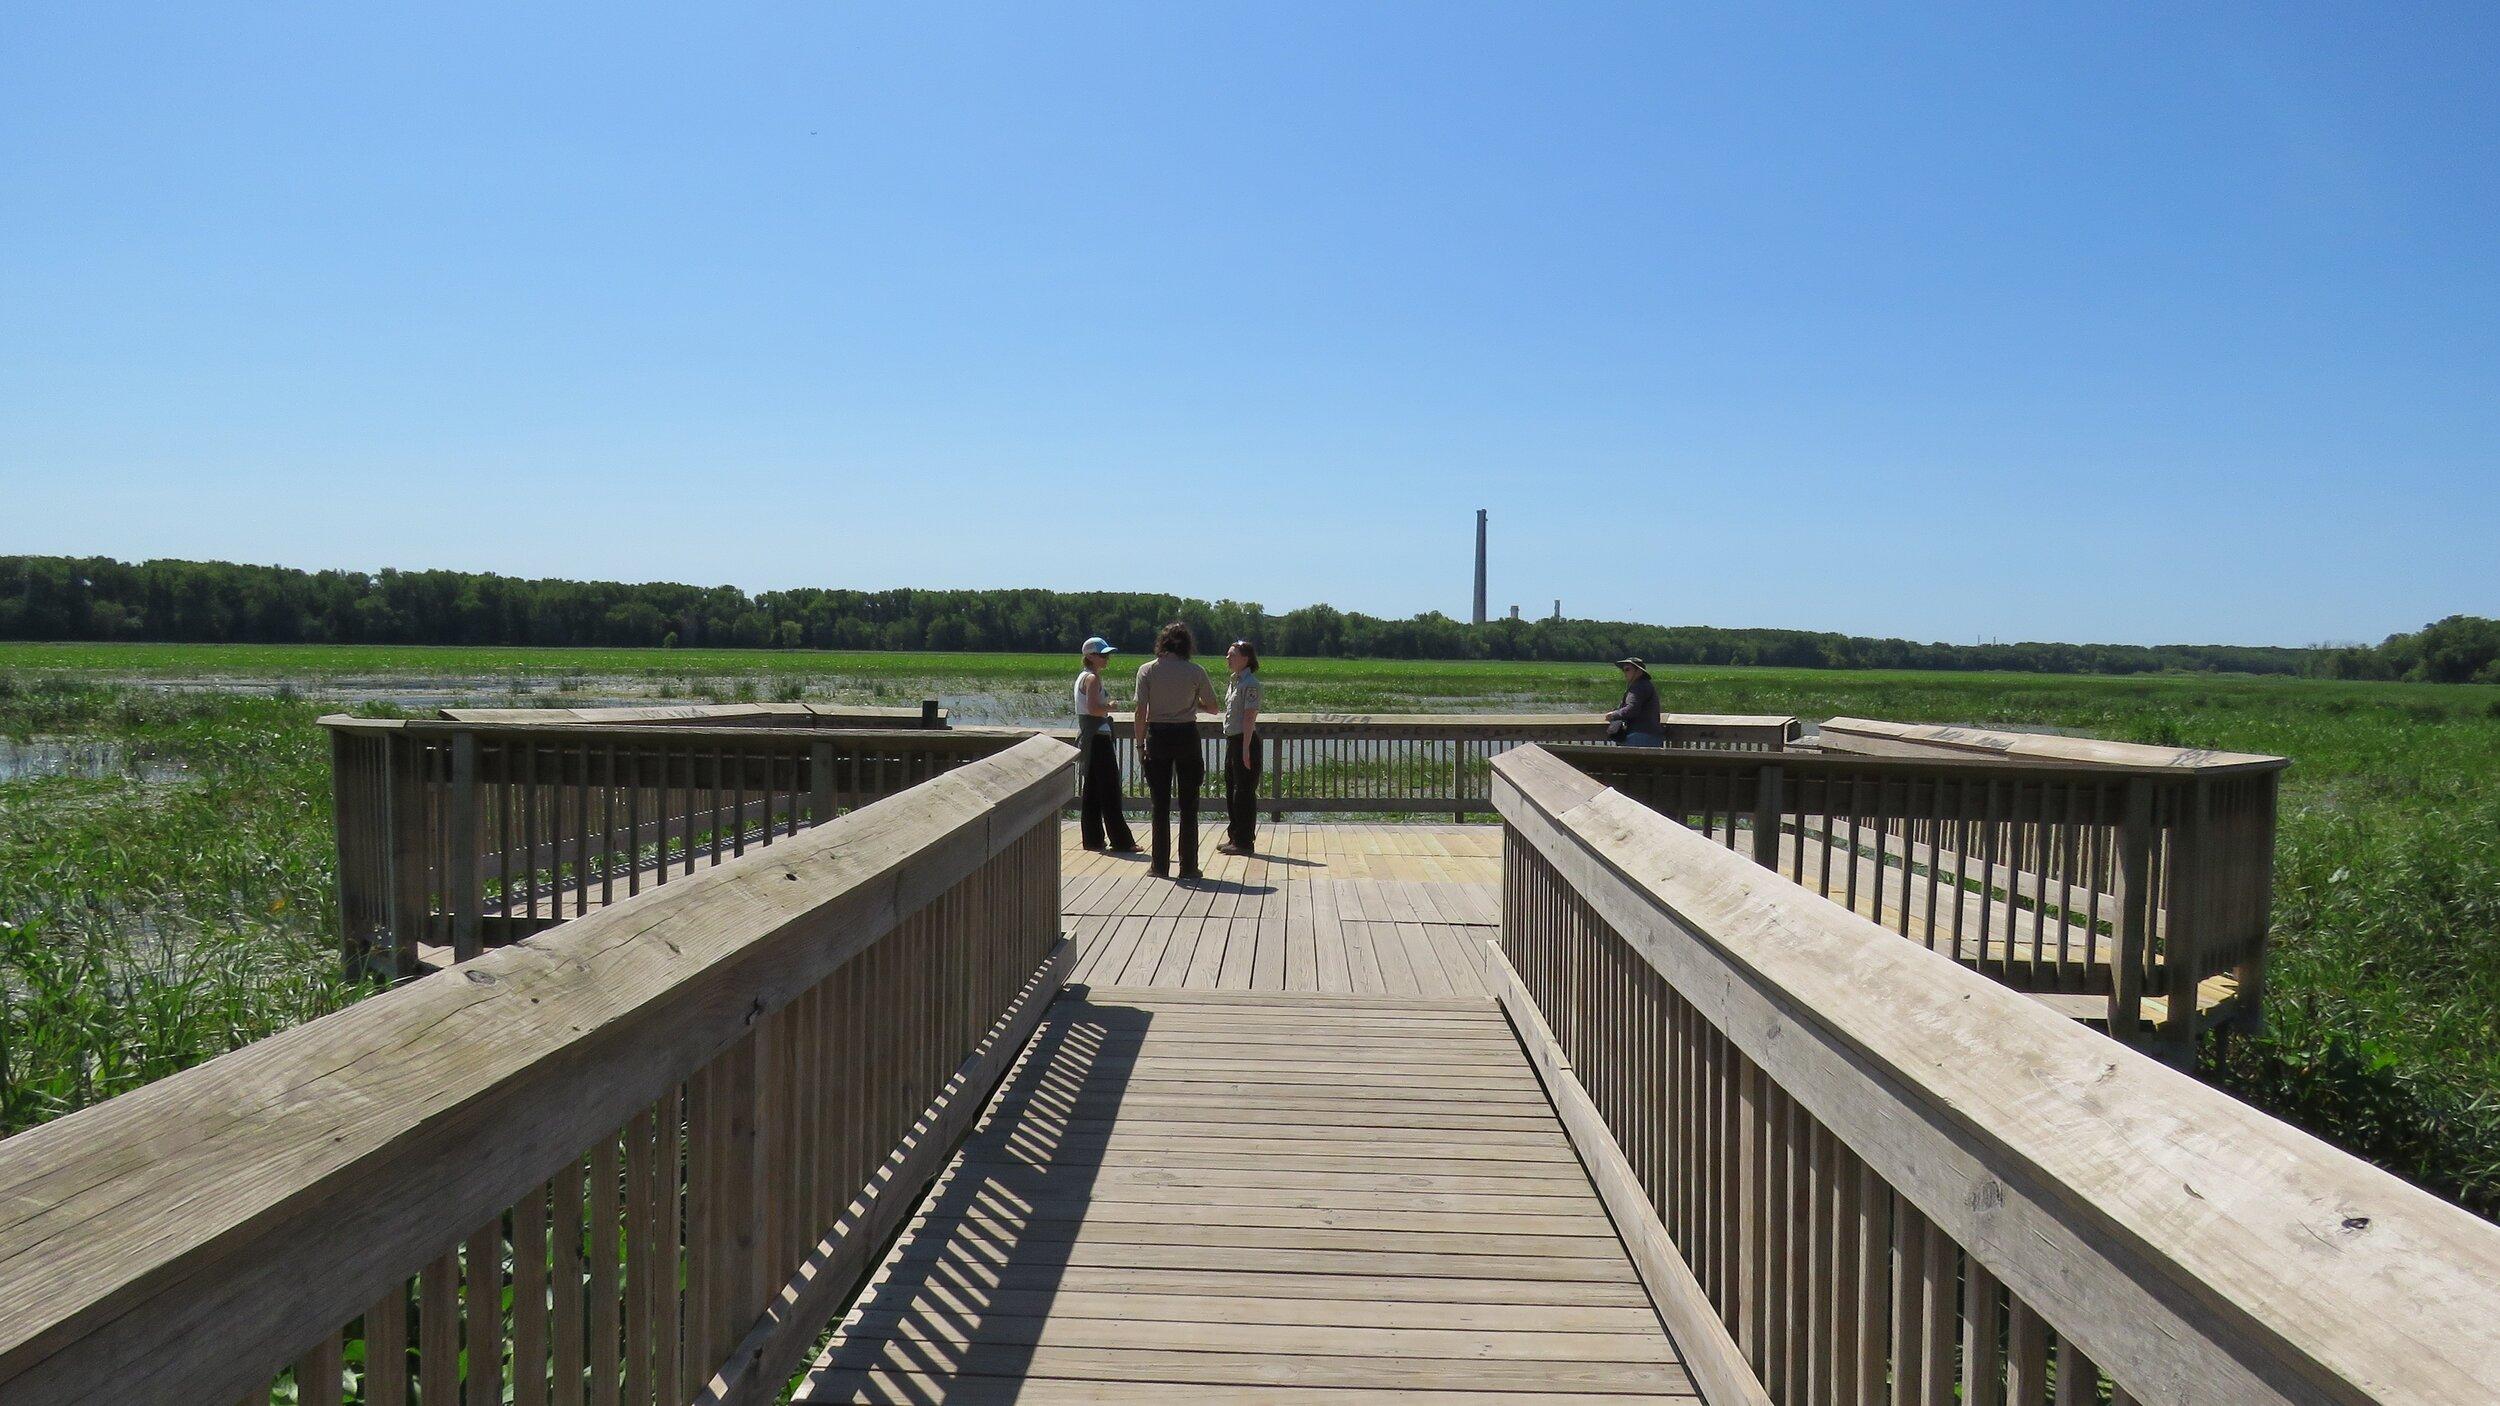 Refuge staff enjoy views of the Minnesota River valley. Gina Hatch/USFWS.